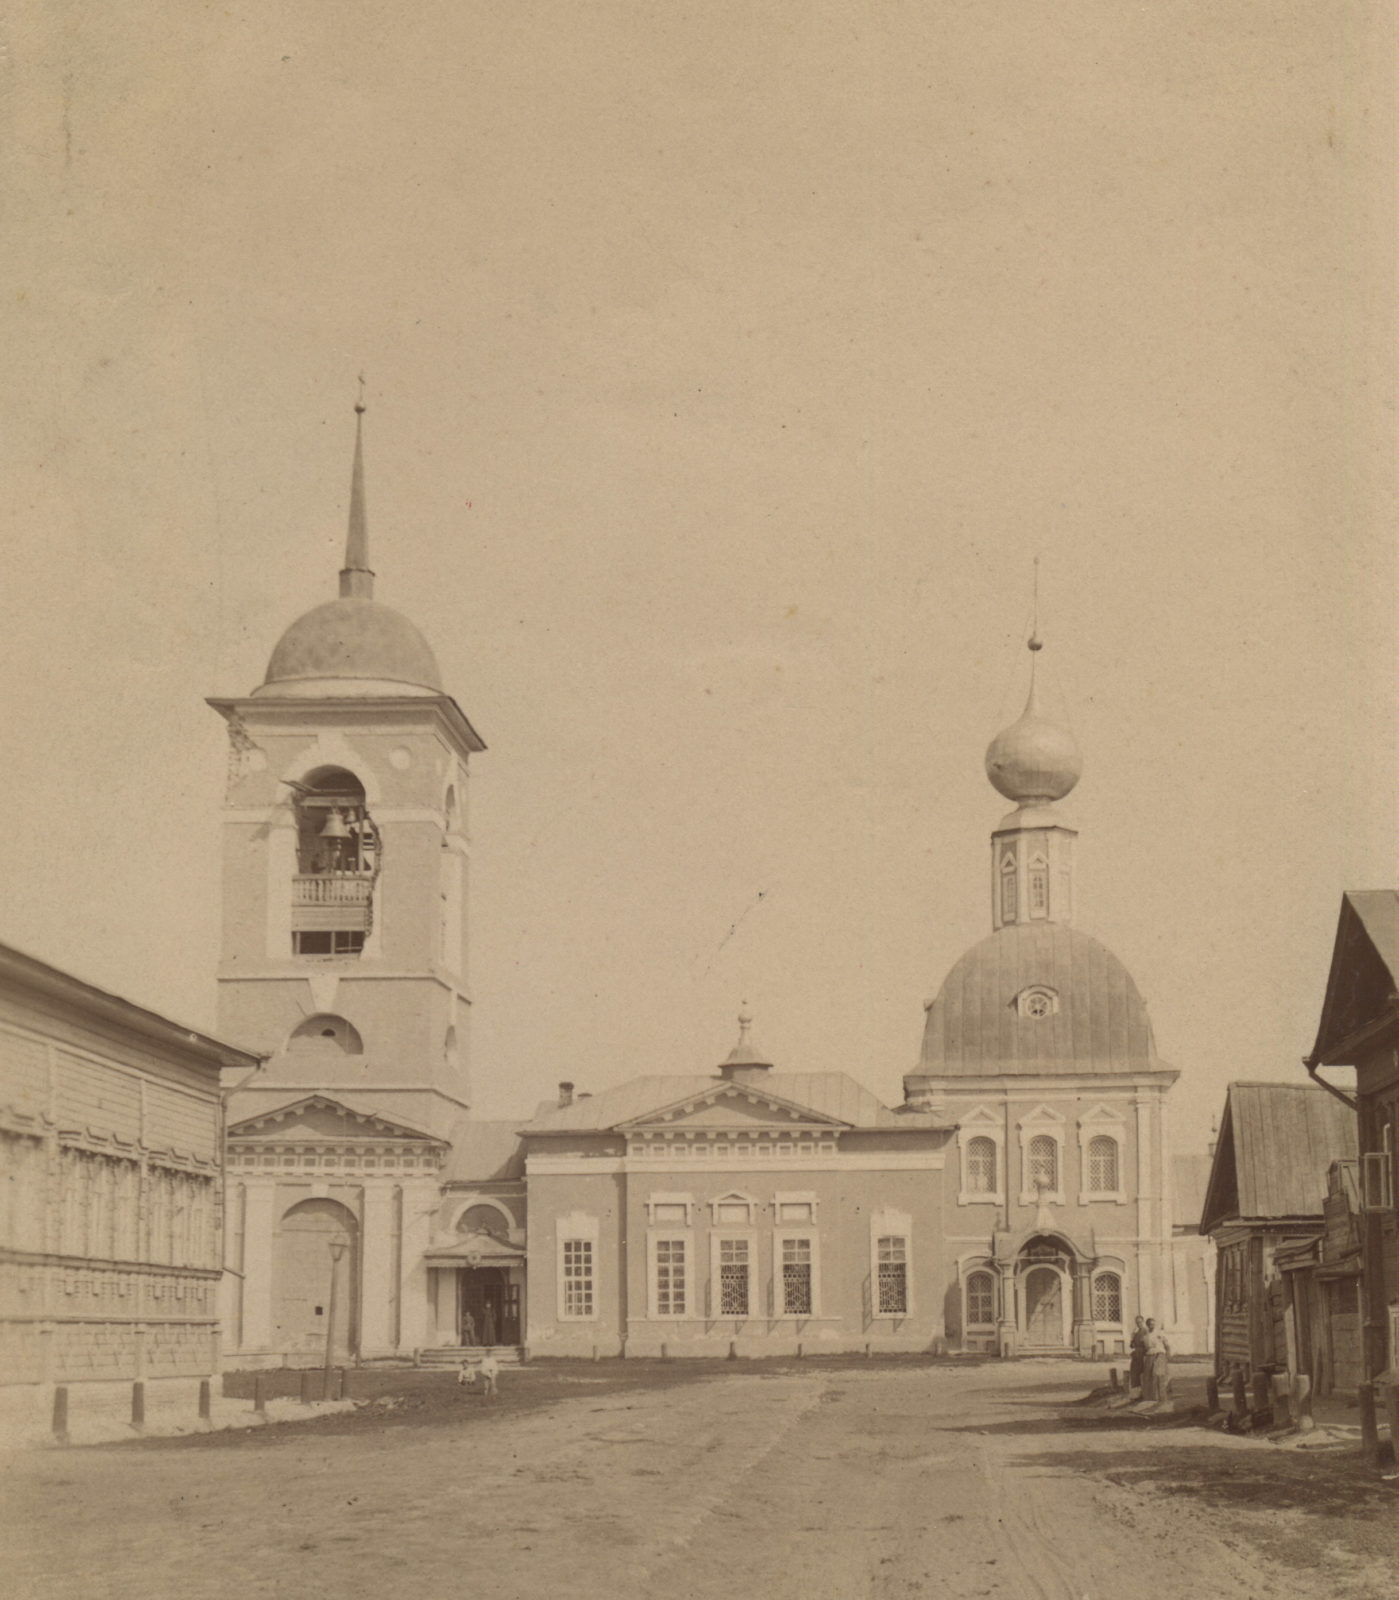 Murom, Vladimir Province, Russia, Church of the Assumption.